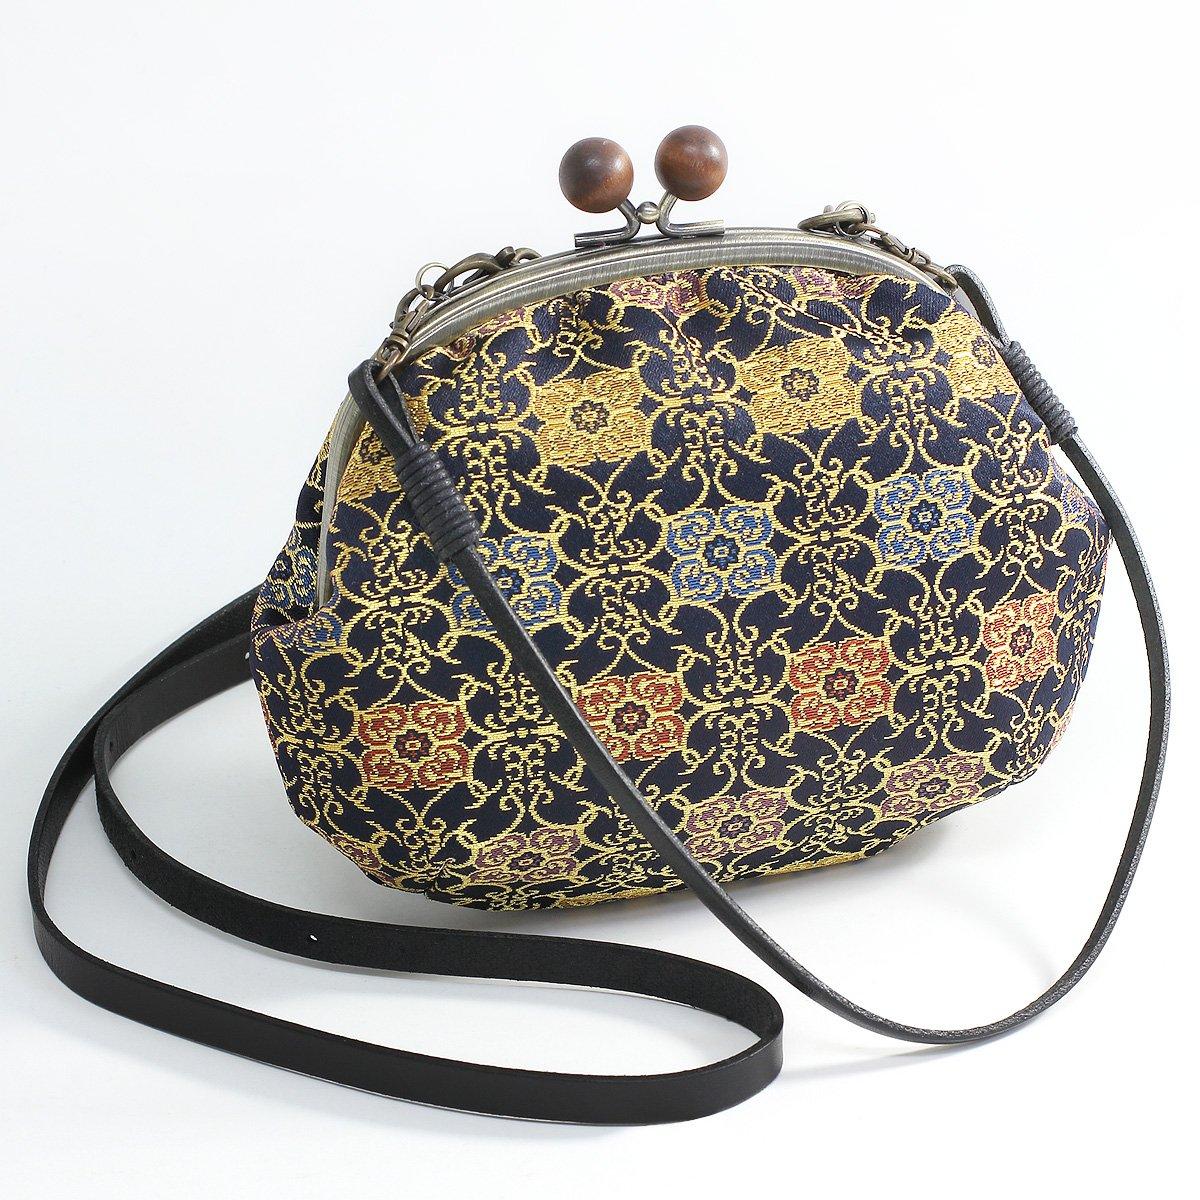 Mieko Women's Japanese Style Bag Traditional Kimono Nishijin-Ori Gamaguchi (Made in Kyoto Japan) by Mieko